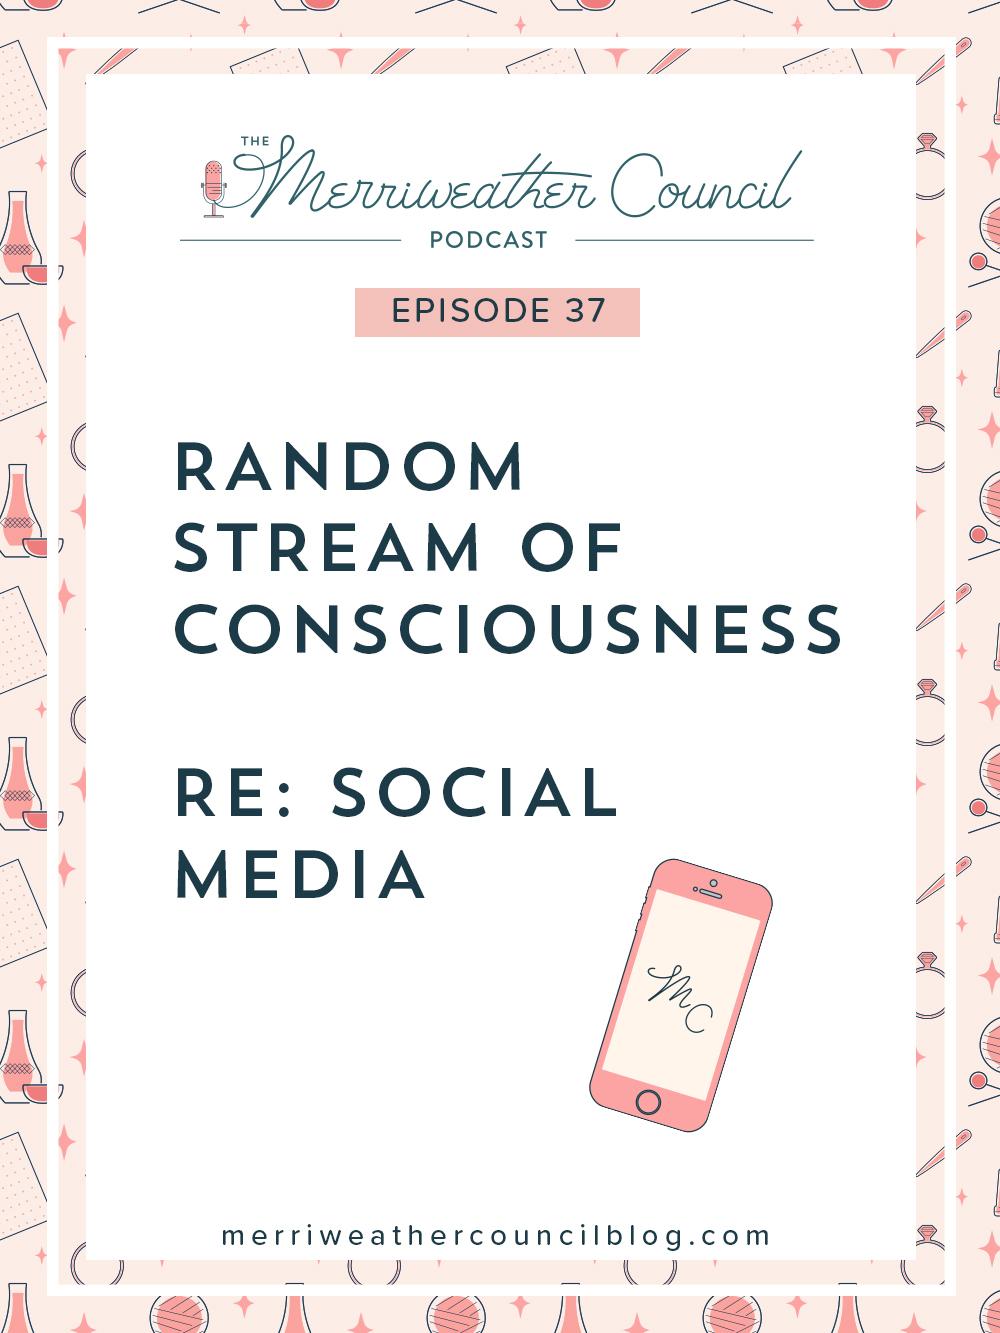 Episode 37: Random Stream of Consciousness re: Social Media | The Merriweather Council Podcast